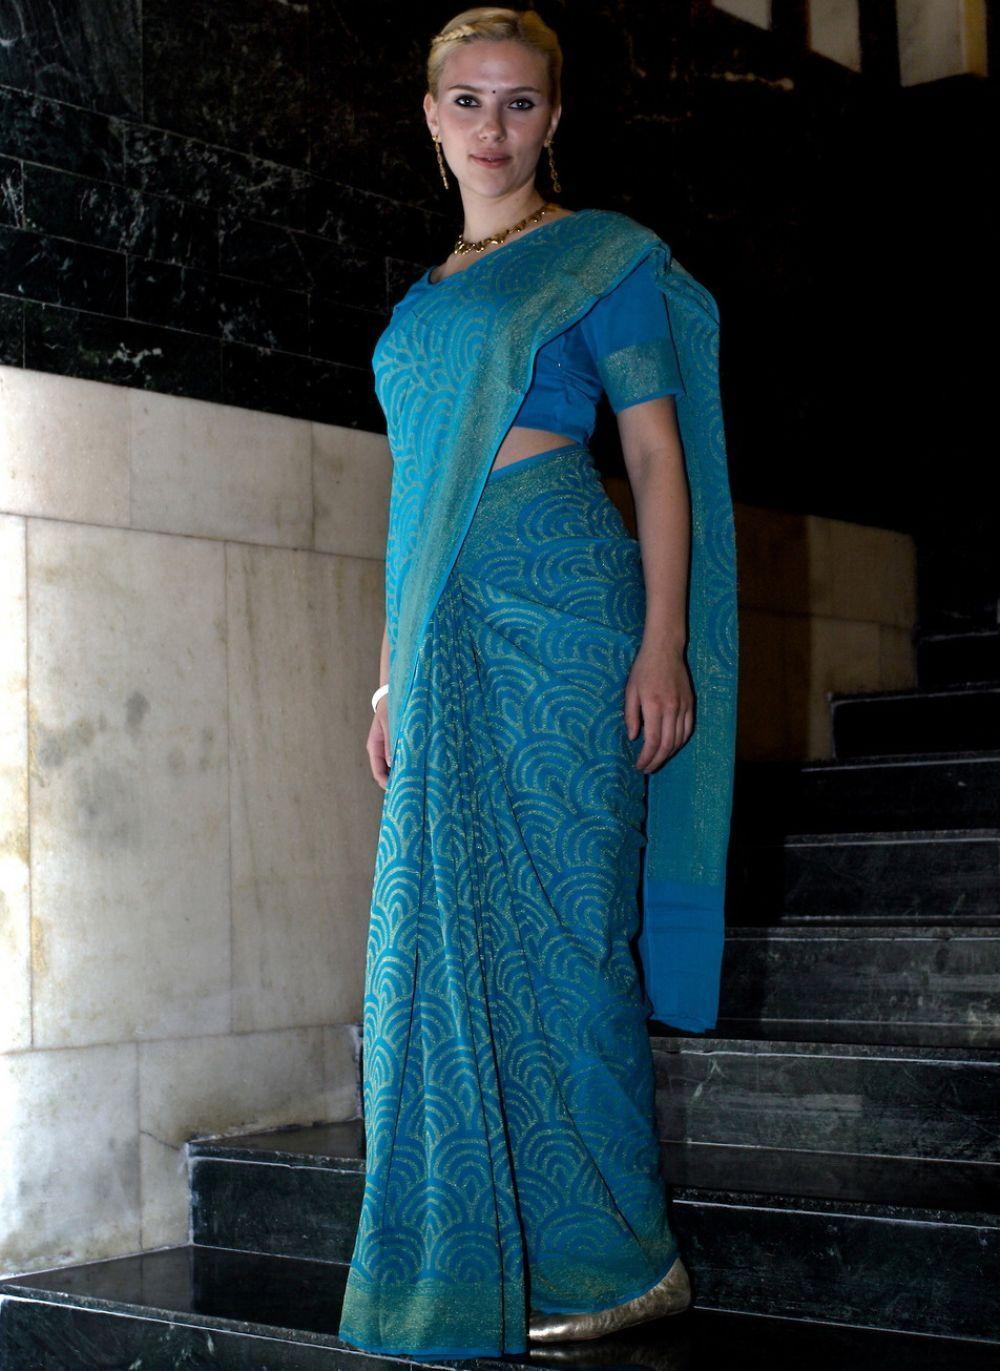 Image result for scarlett johansson in india | Scarlett johansson ...